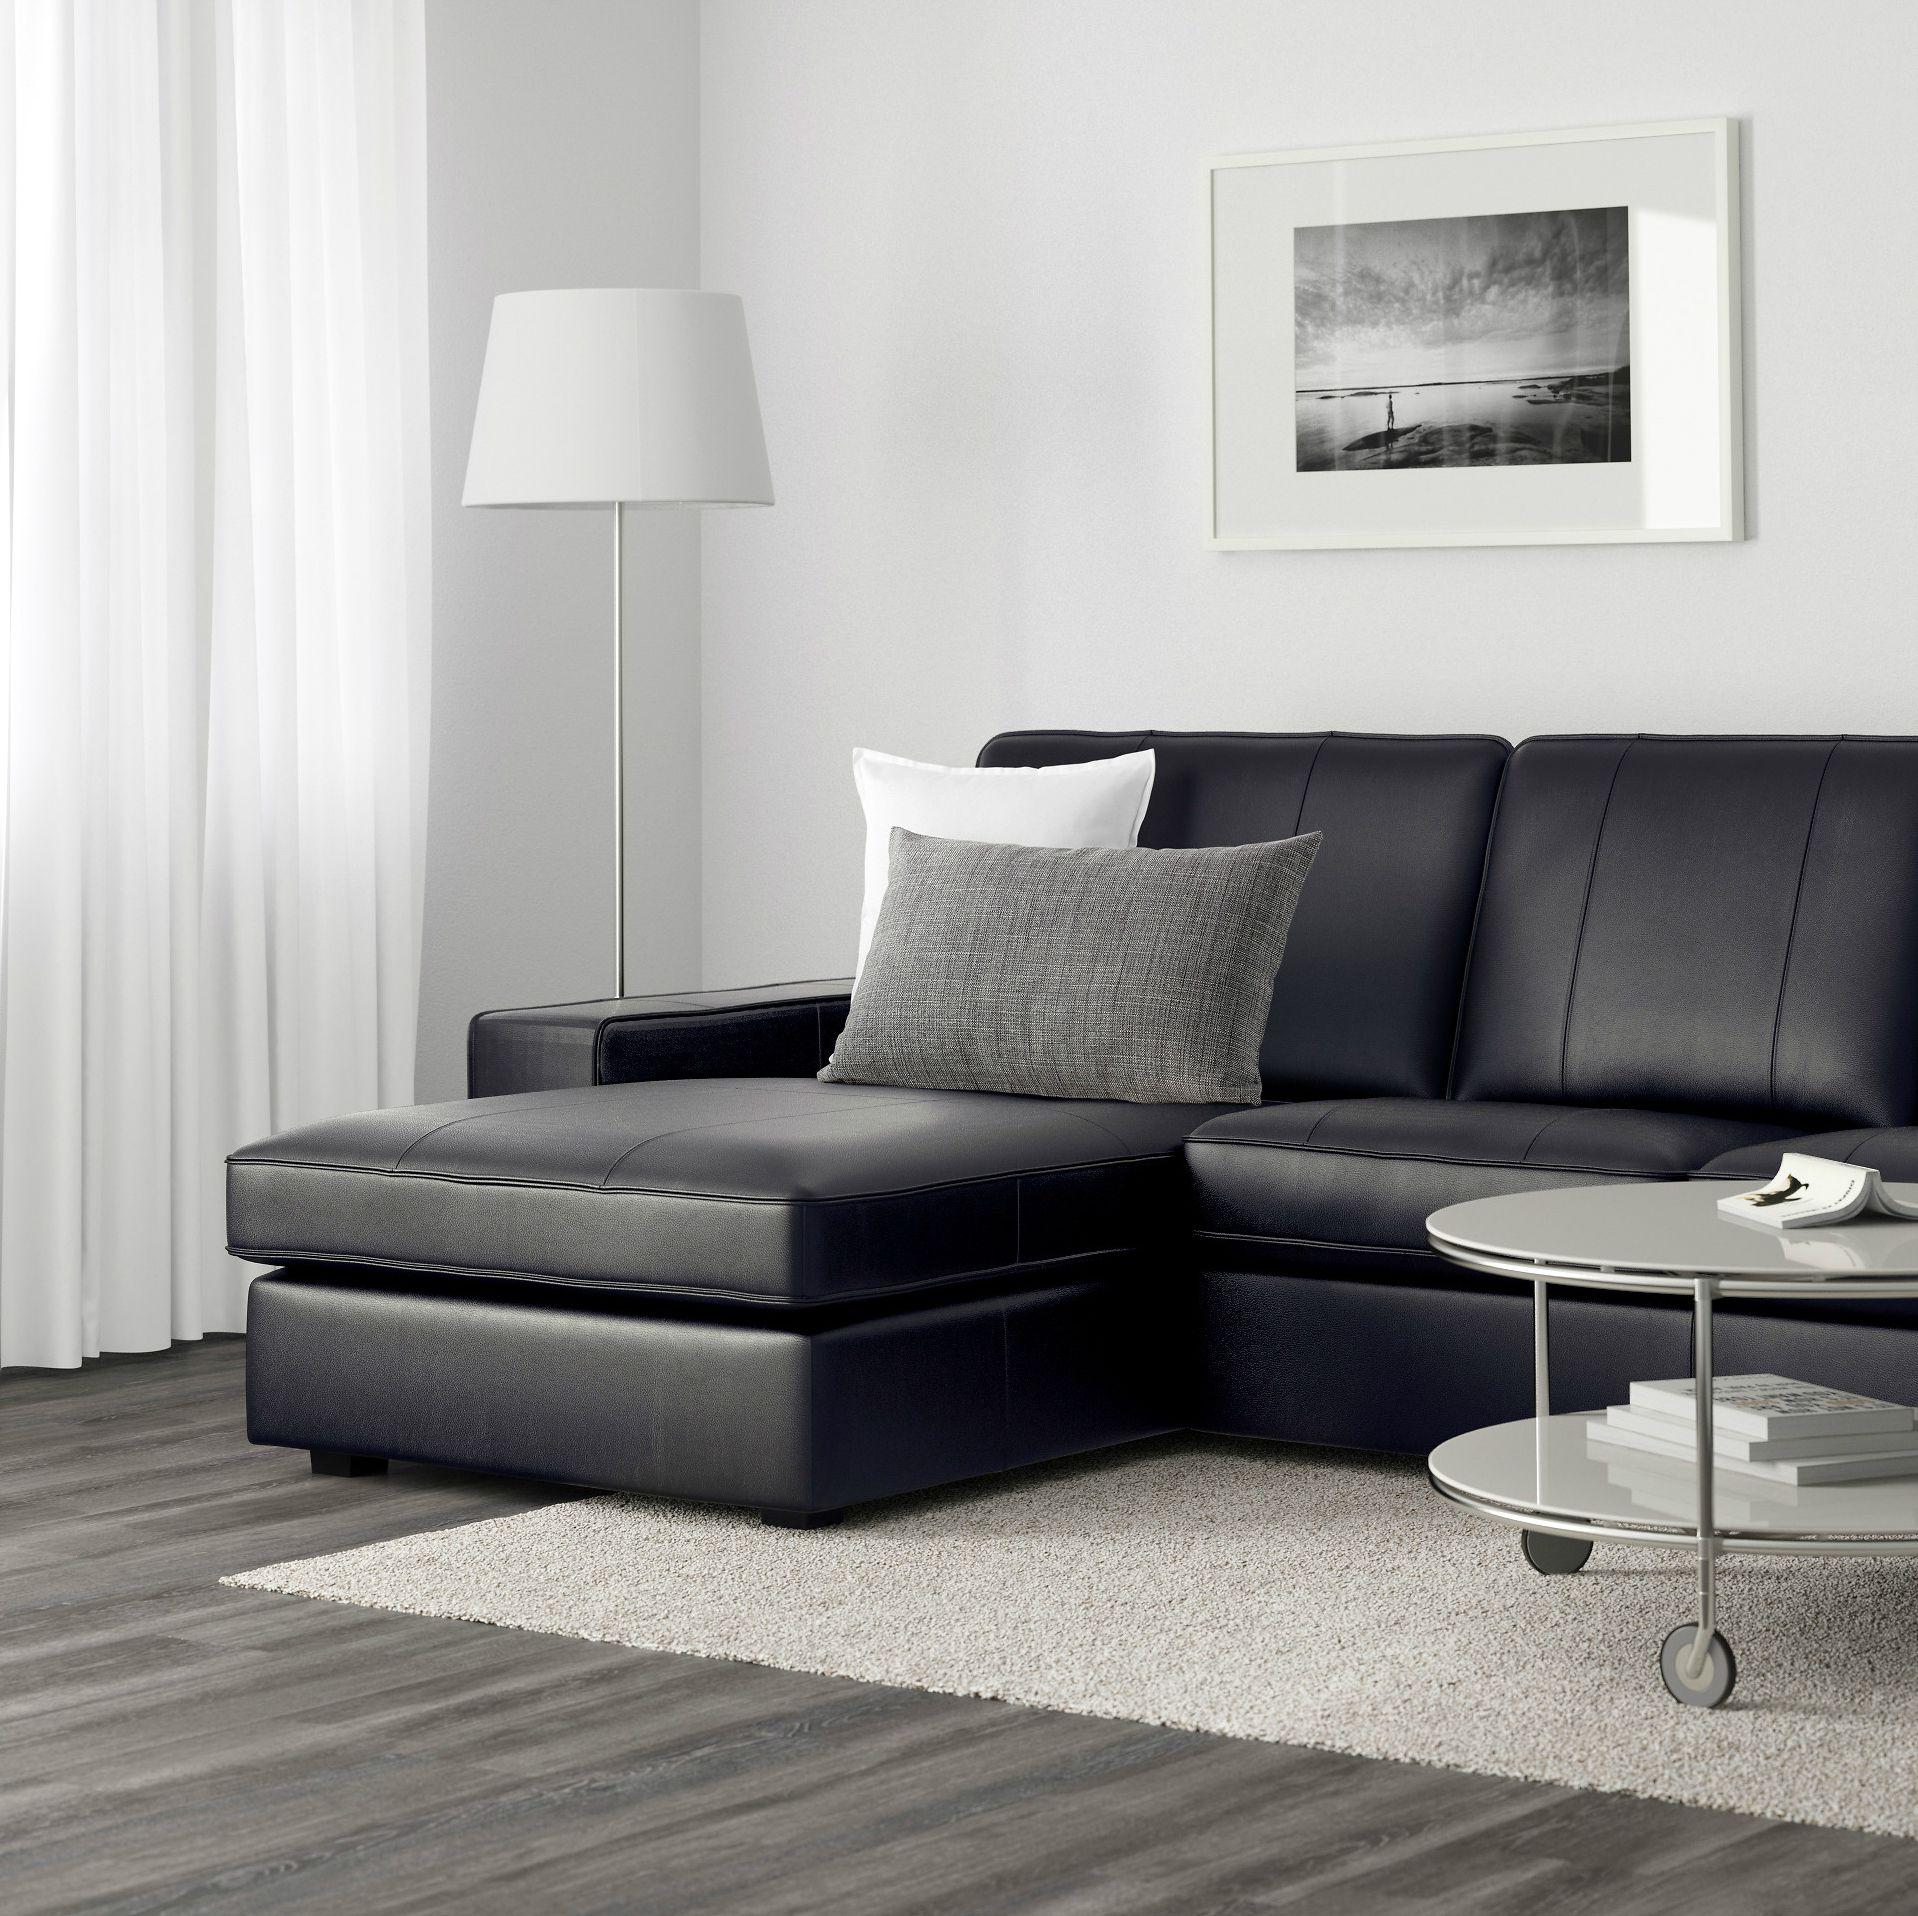 Lorelei Sofa from Simplicity Sofas Reviewed